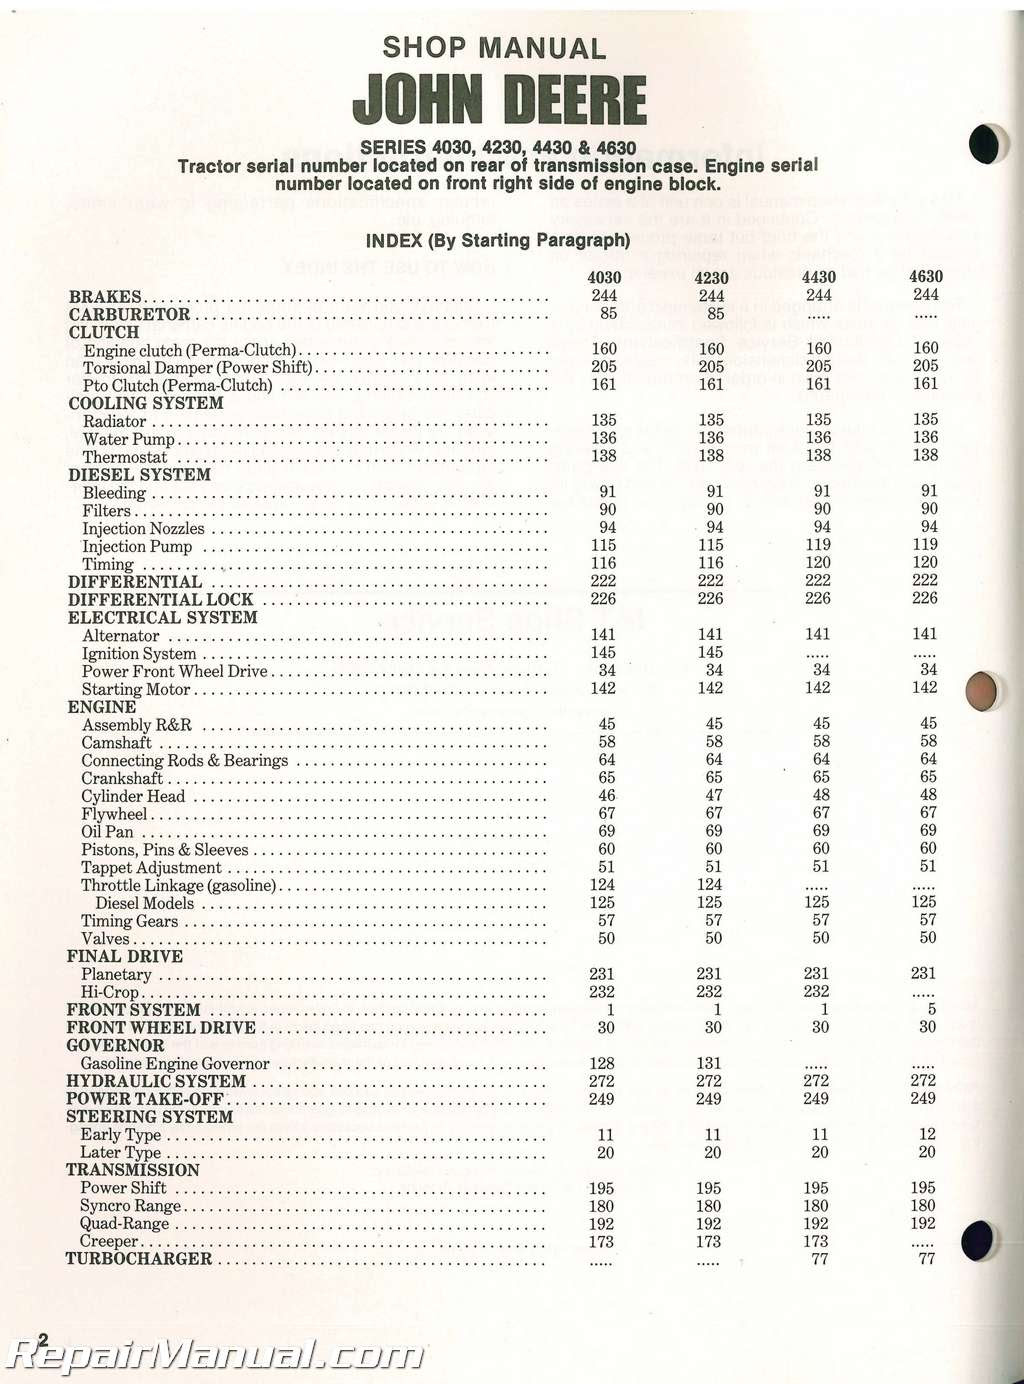 Diagram John Deere 4030 Wiring Diagram Manual Full Version Hd Quality Diagram Manual Baseddiagram Listacasinoonlinesicuri It